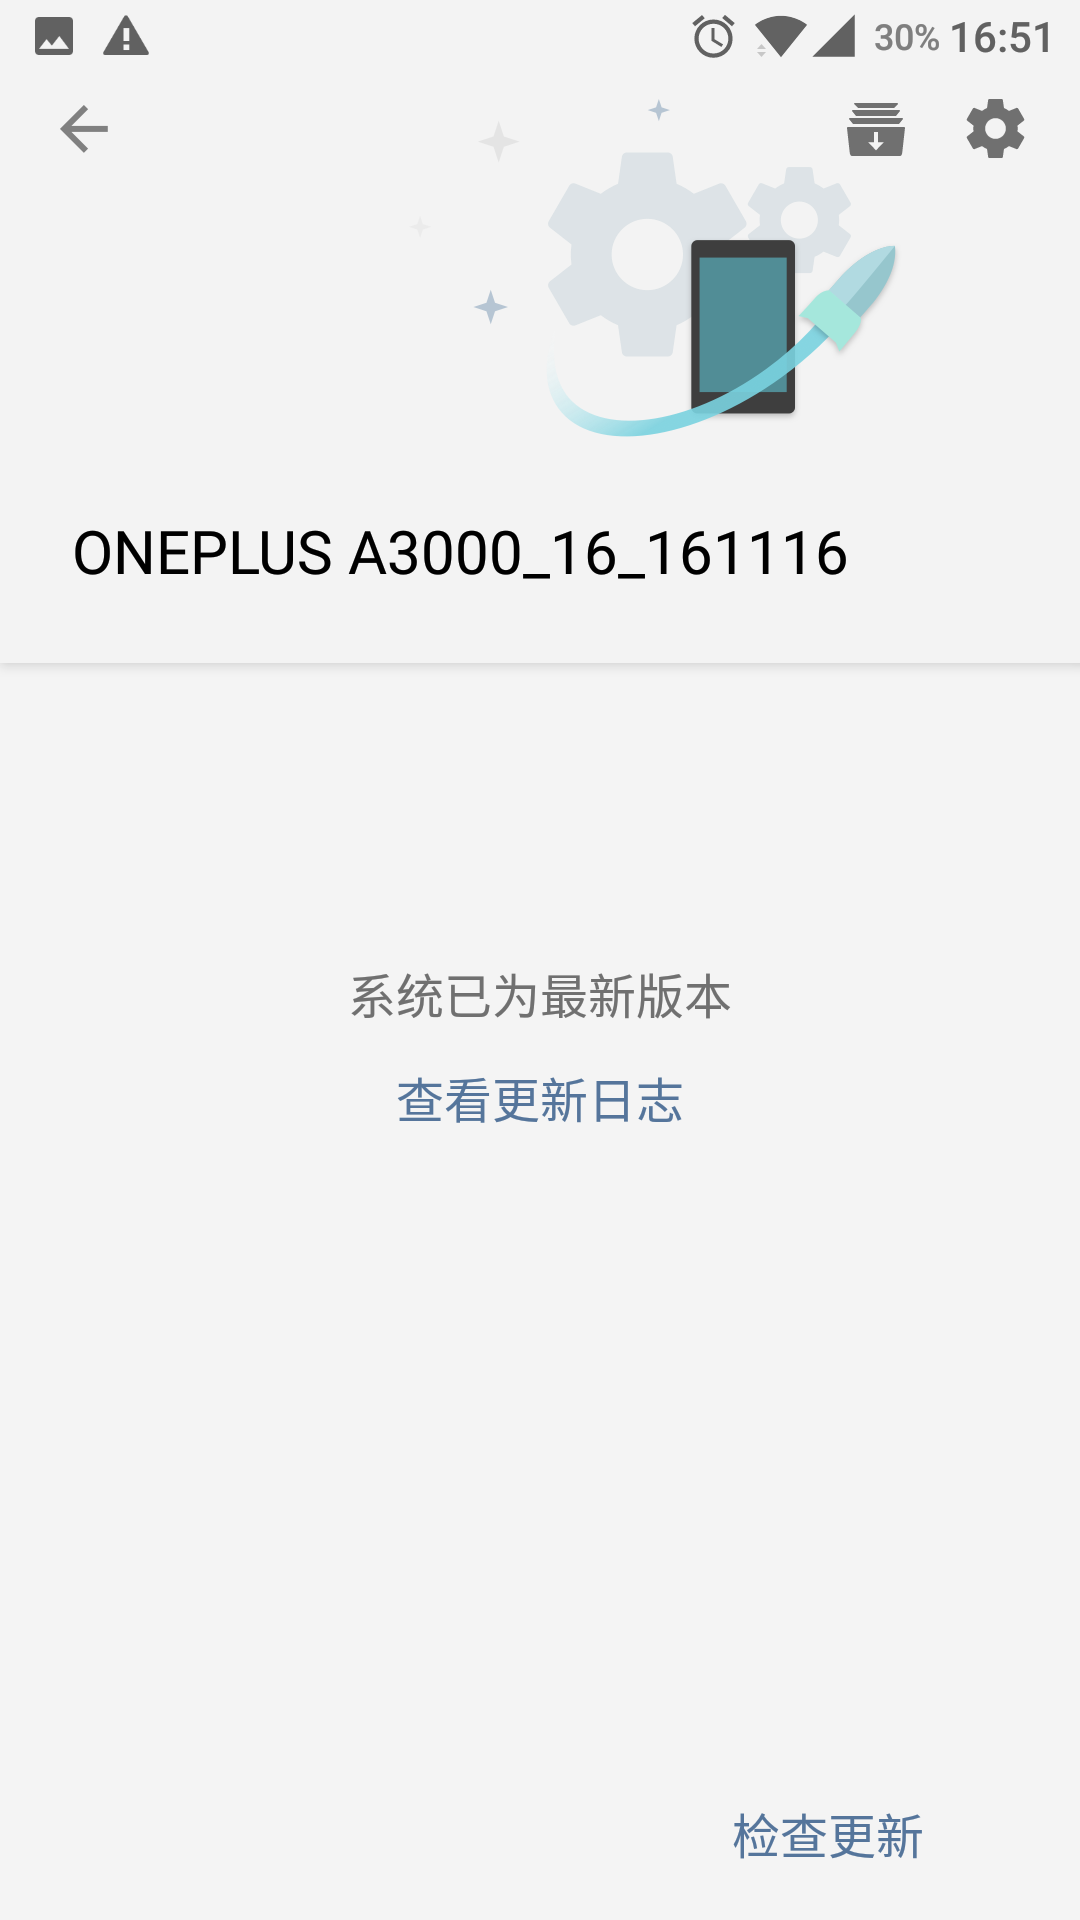 Screenshot_20161124-165149.png